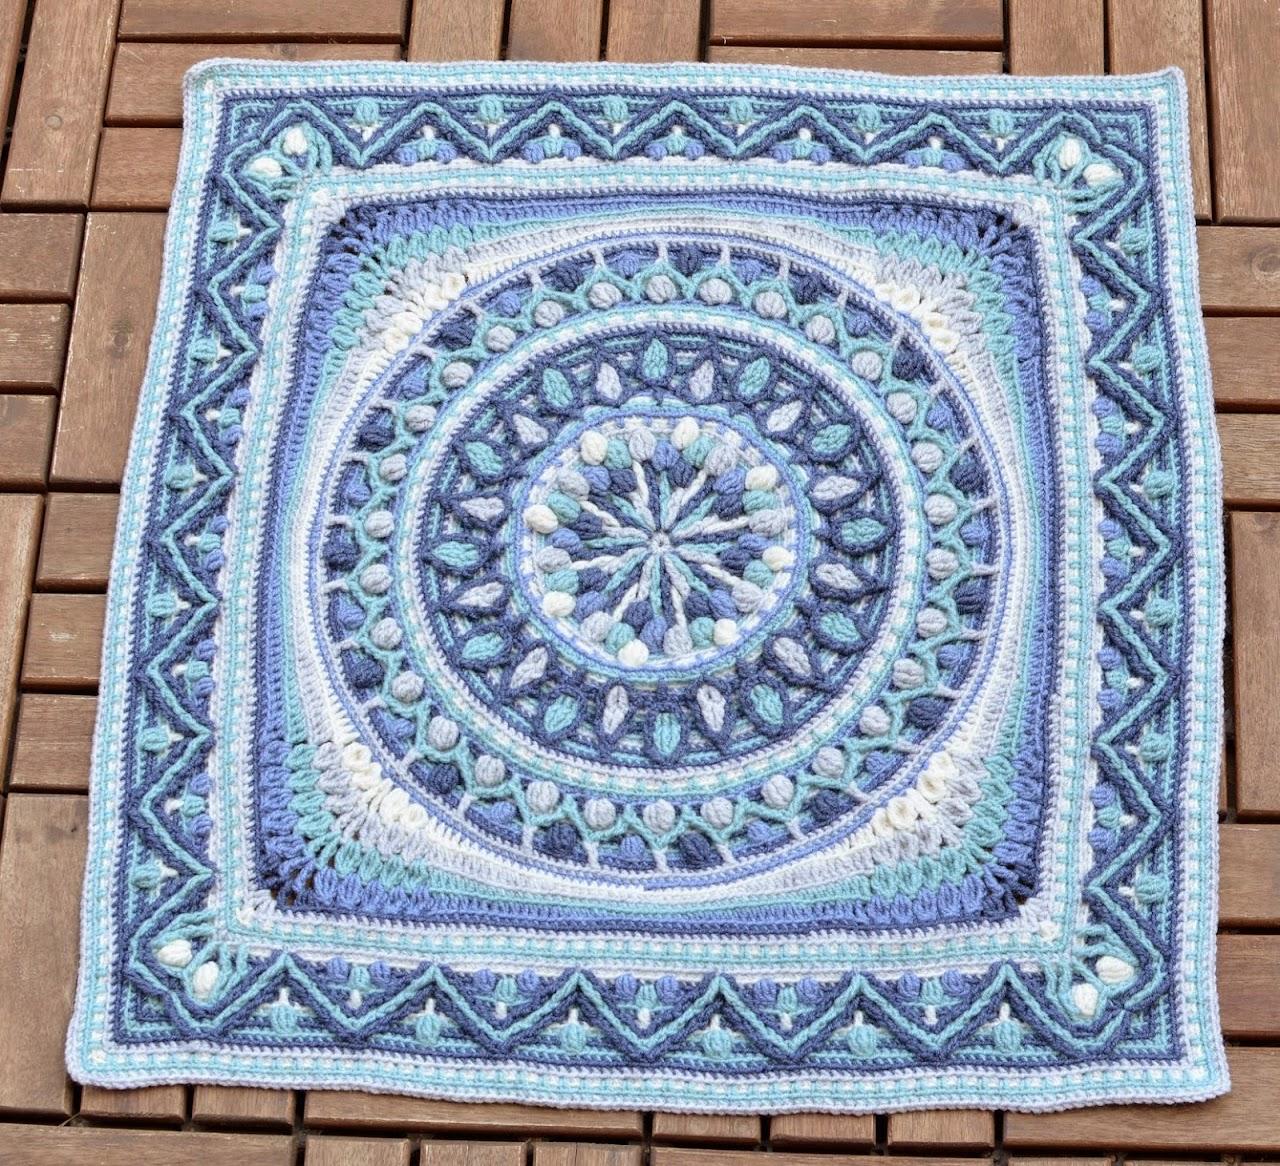 Large Mandala Square in Overlay Crochet